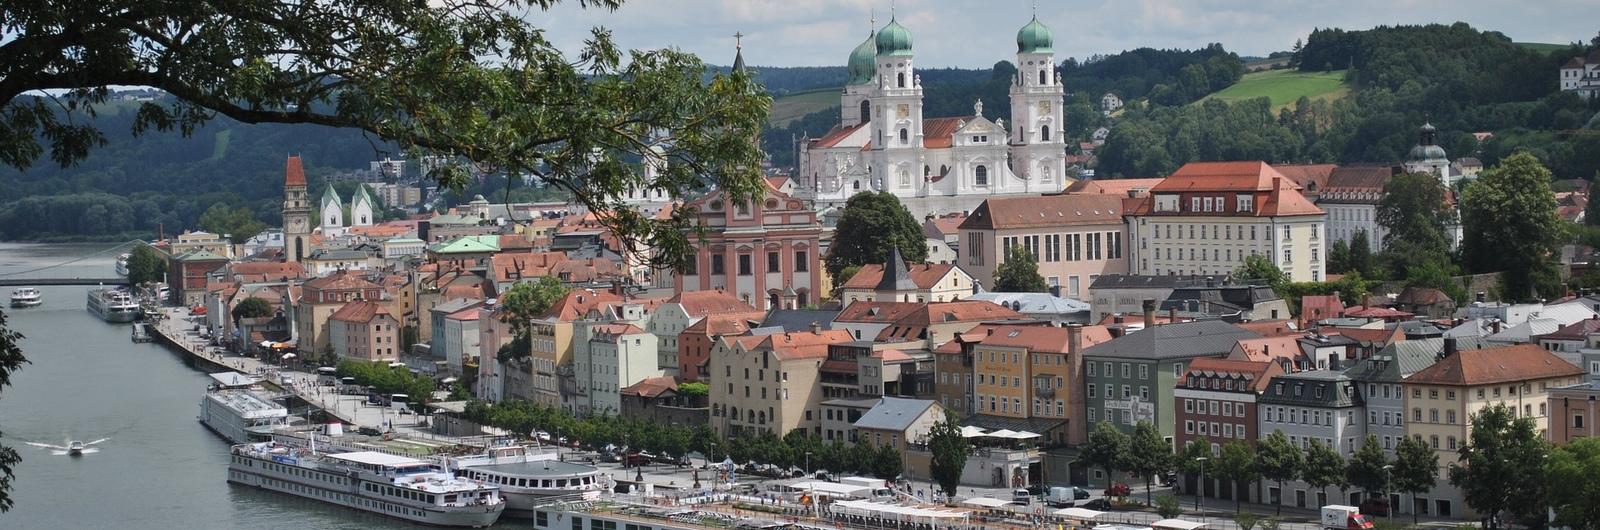 Huren Passau